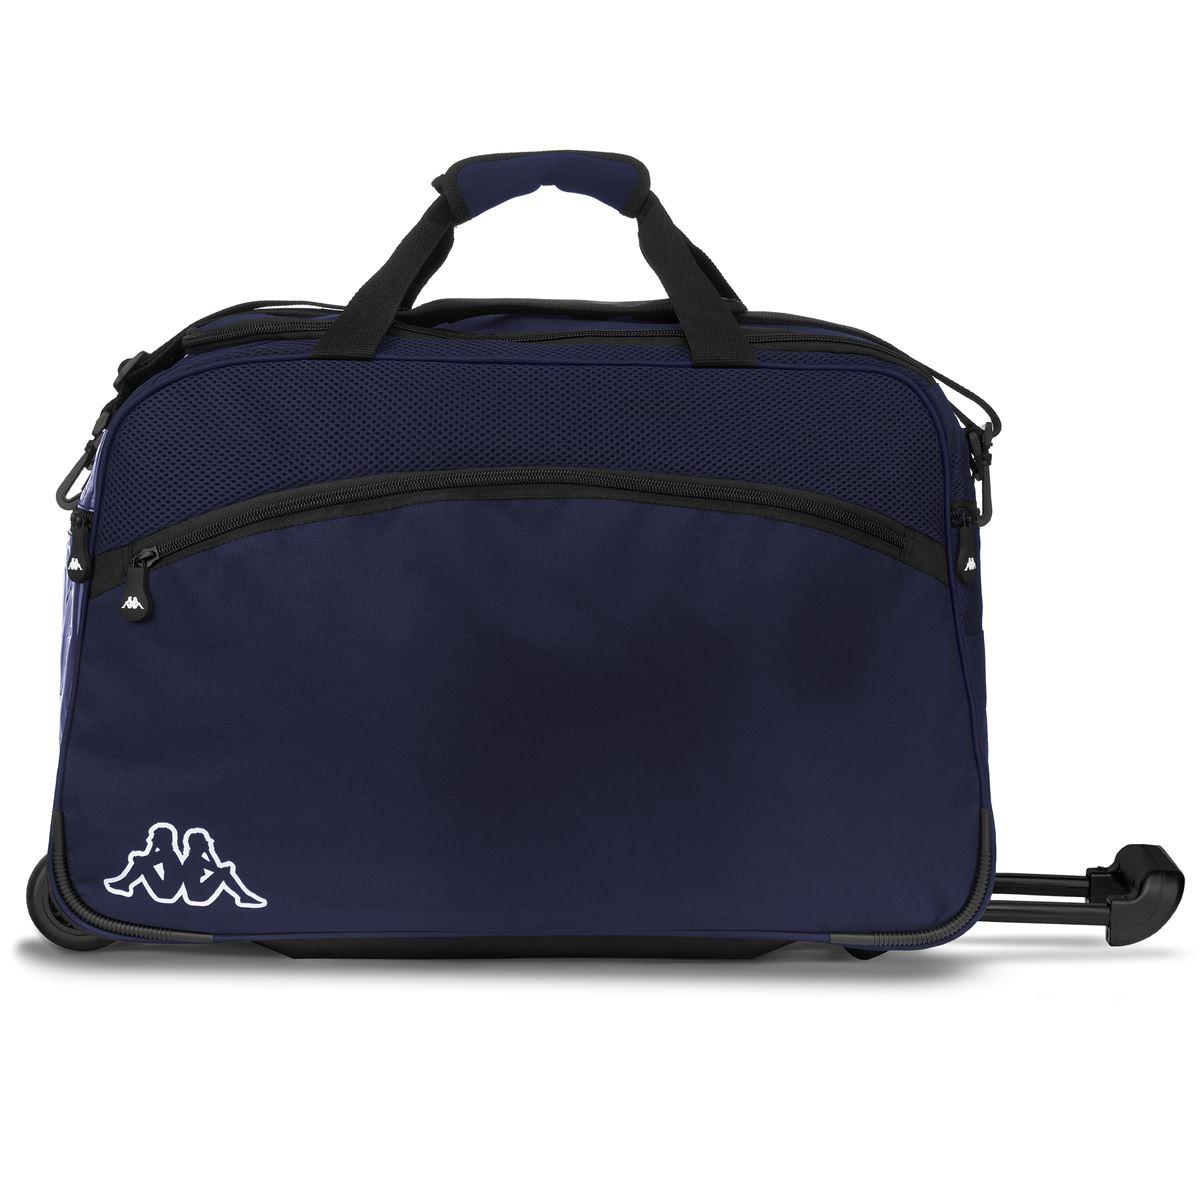 Kappa Borsa WINCOM Uomo Donna Viaggio Trolley